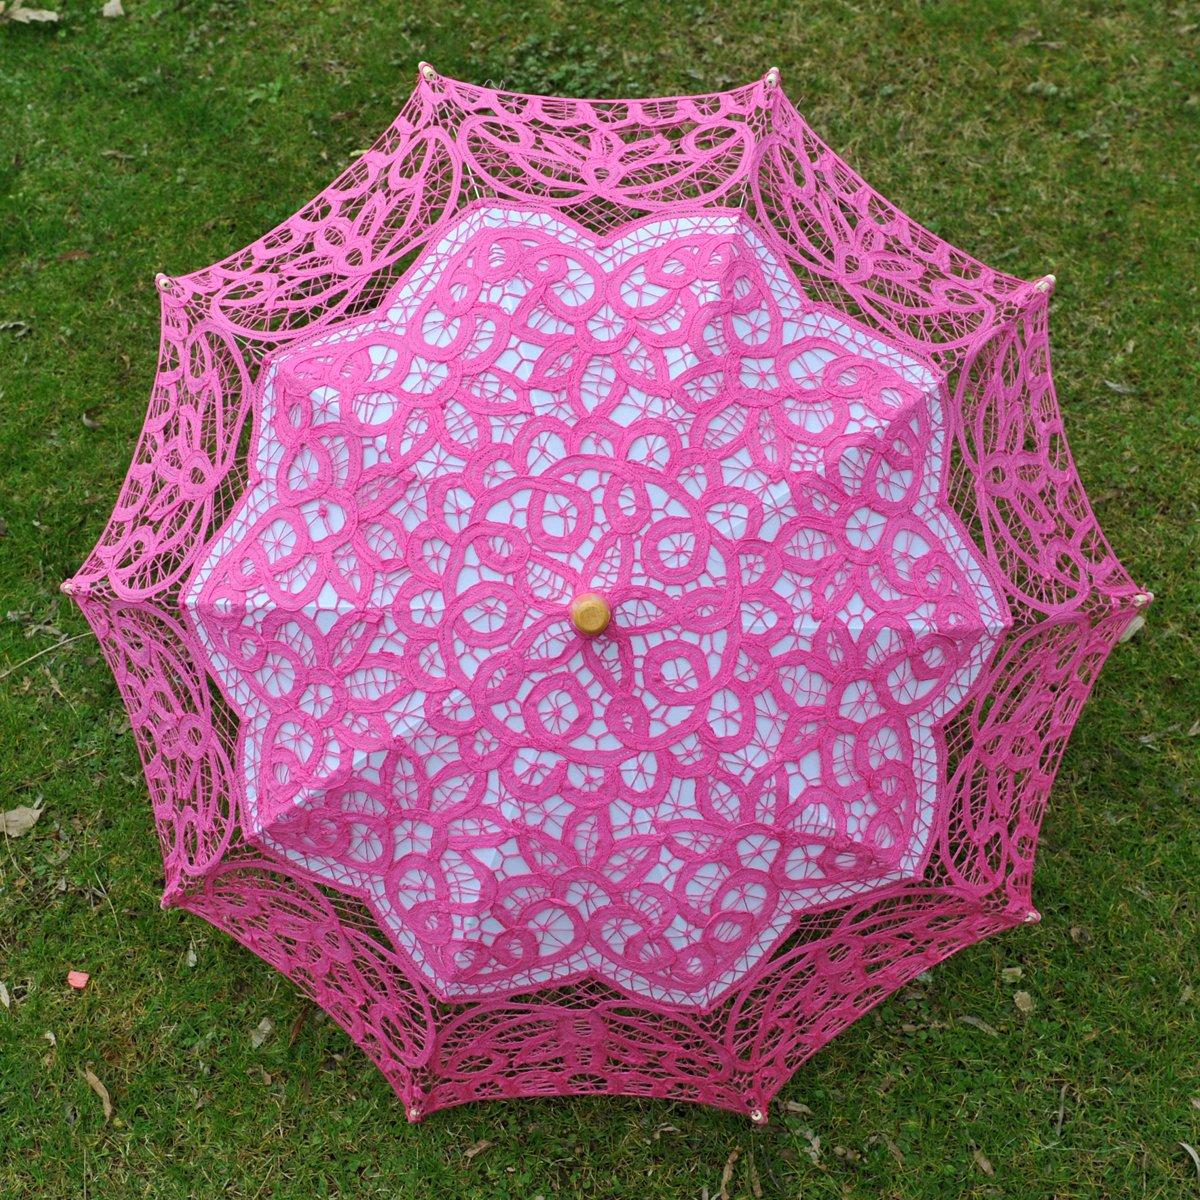 Topwedding Classic Cotton Lace Parasol Umbrella Bridal Shower Decoration, Fuschia by Topwedding (Image #7)